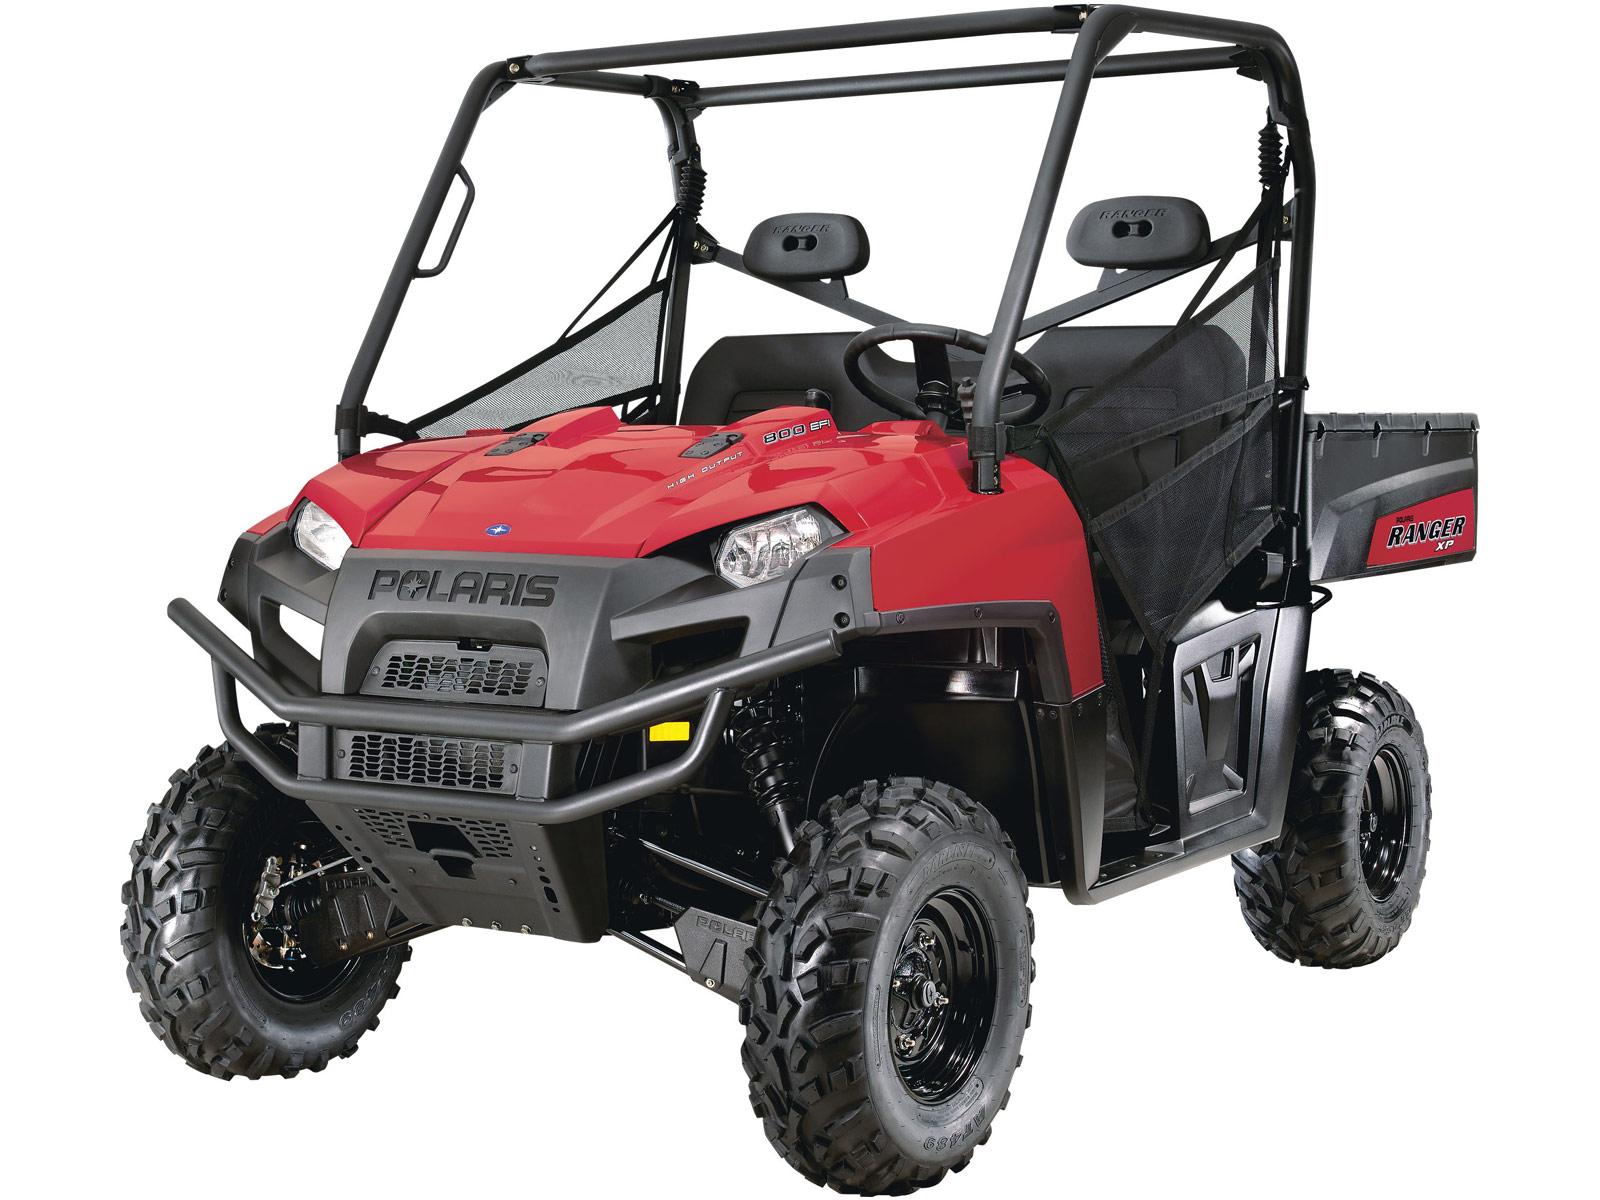 2012 POLARIS Ranger XP800EPS ATV Wallpapers 1600x1200